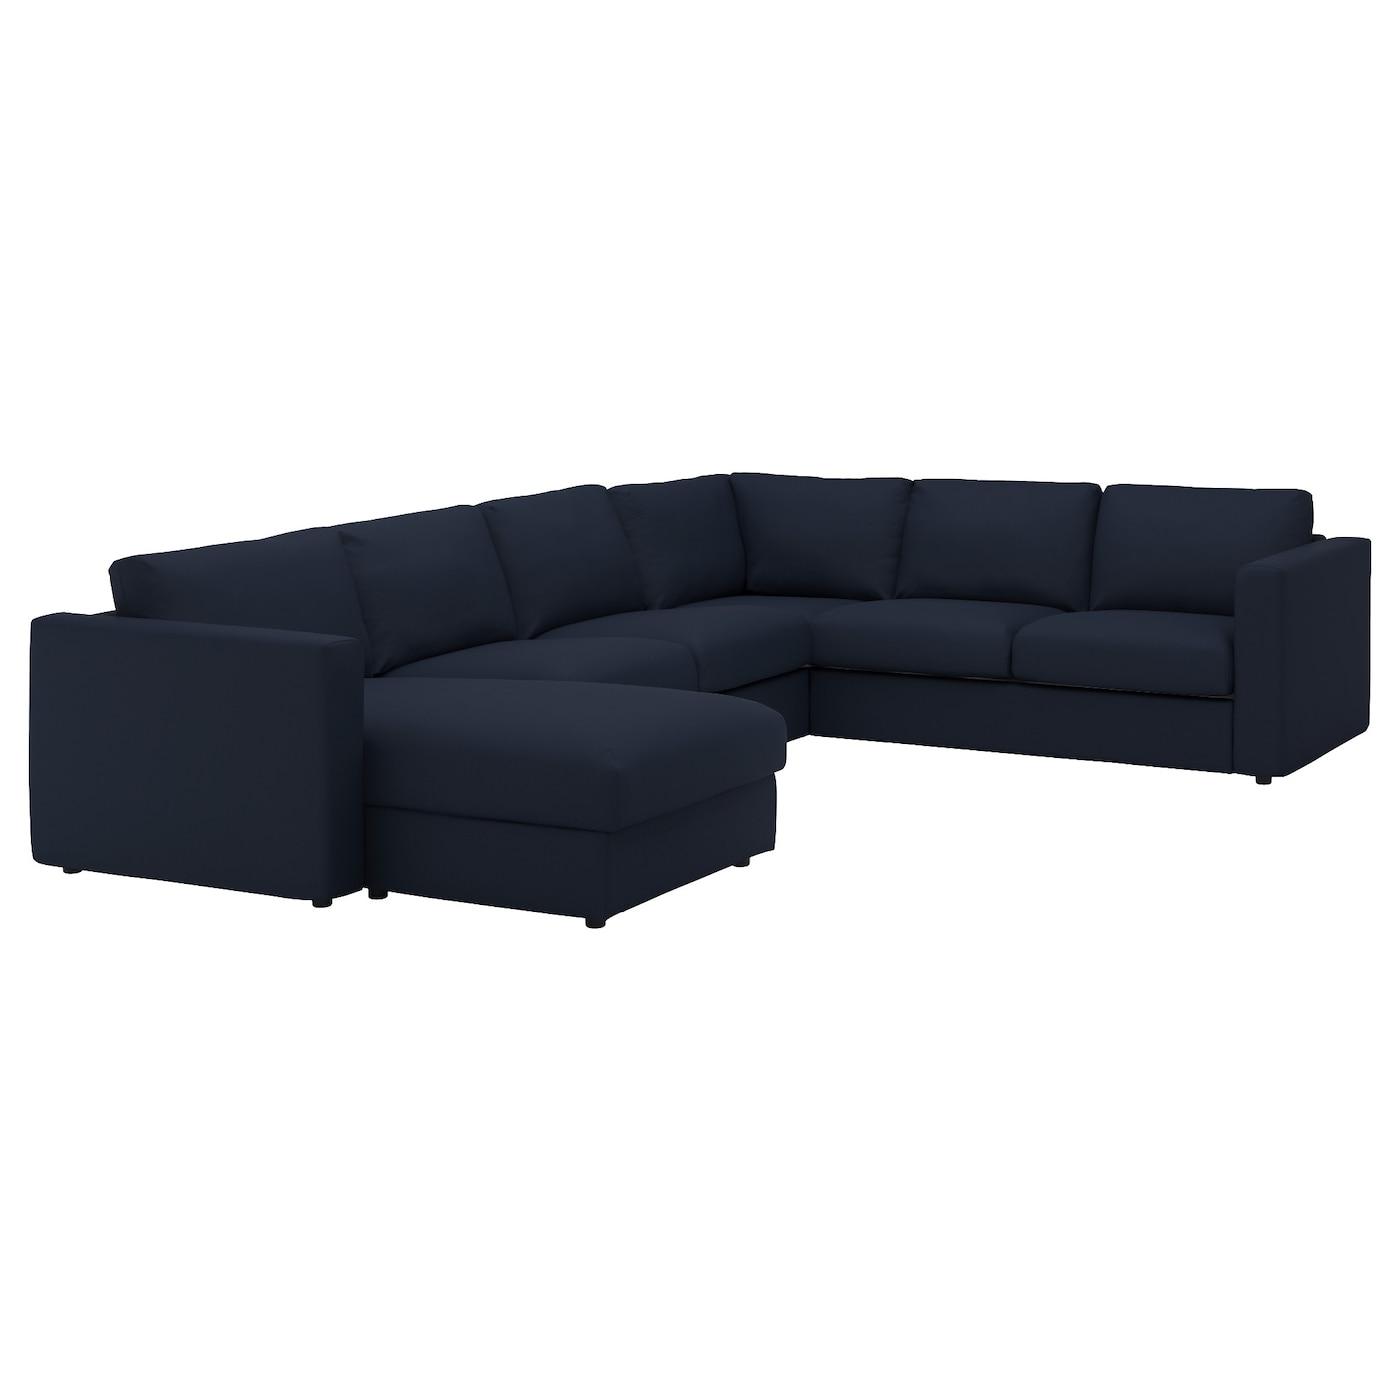 Vimle corner sofa 5 seat with chaise longue gr sbo black for Sofa 5 plazas chaise longue